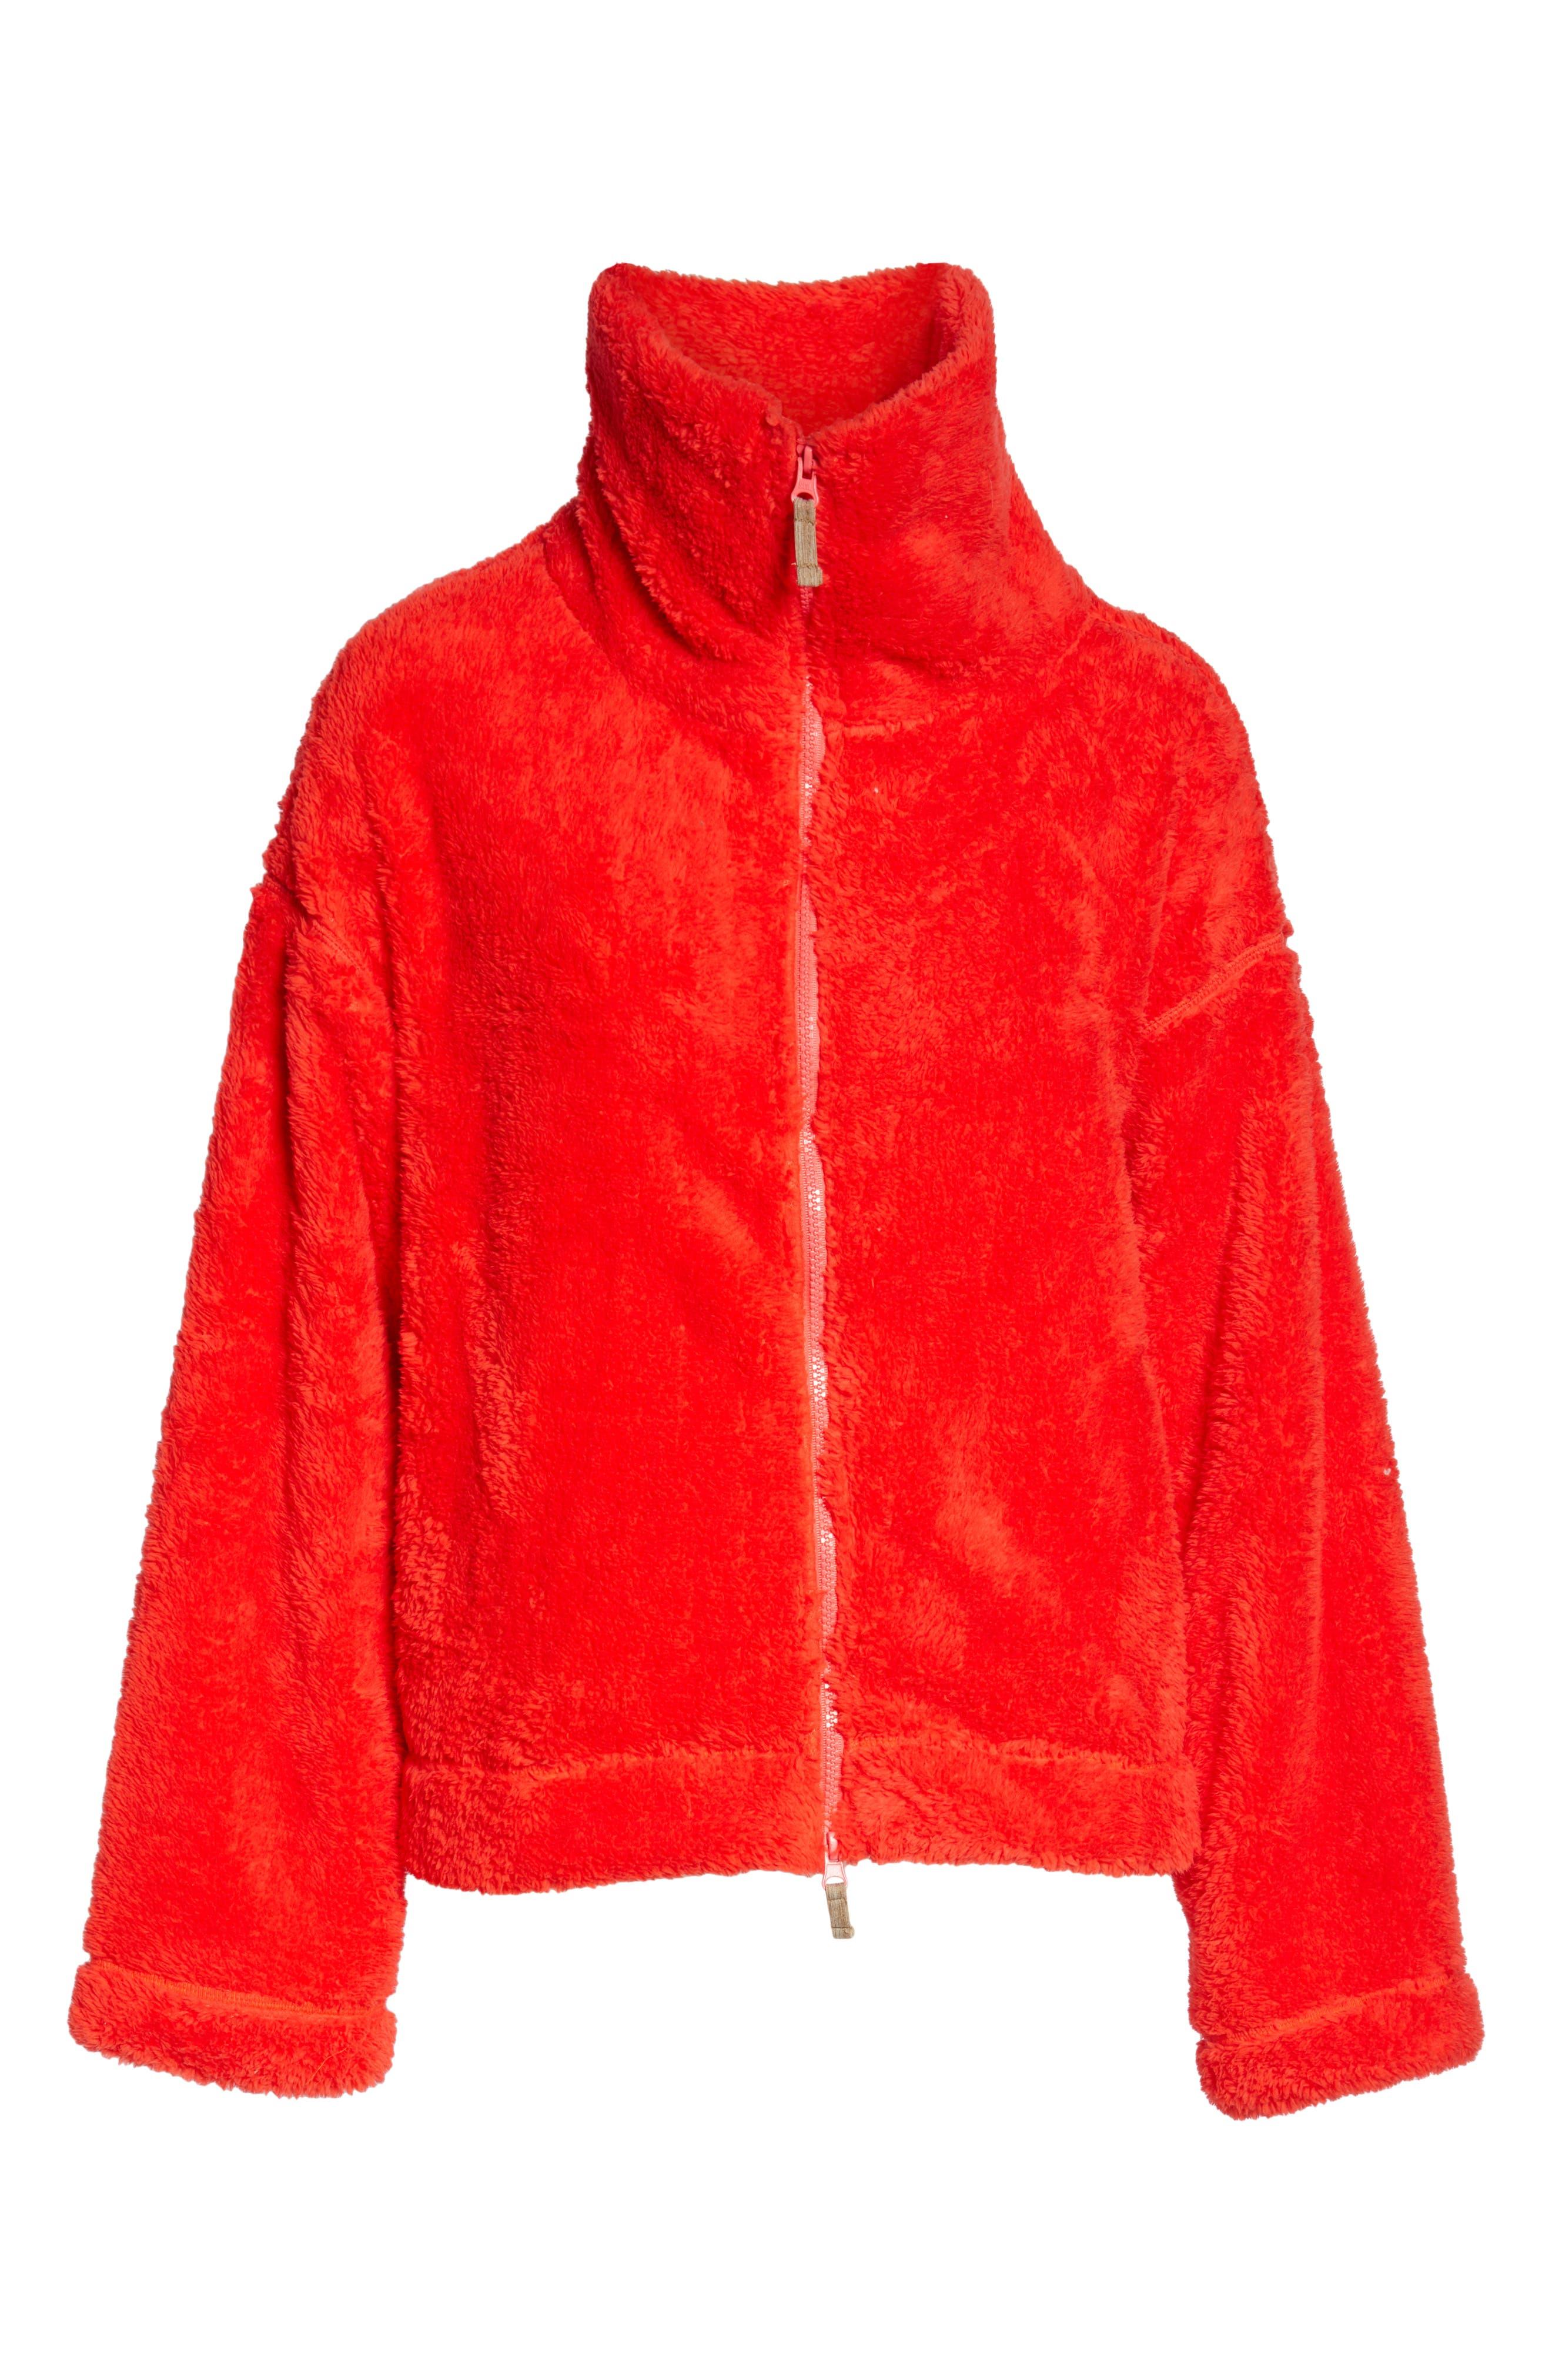 Dazed Fleece Jacket,                             Alternate thumbnail 7, color,                             RED